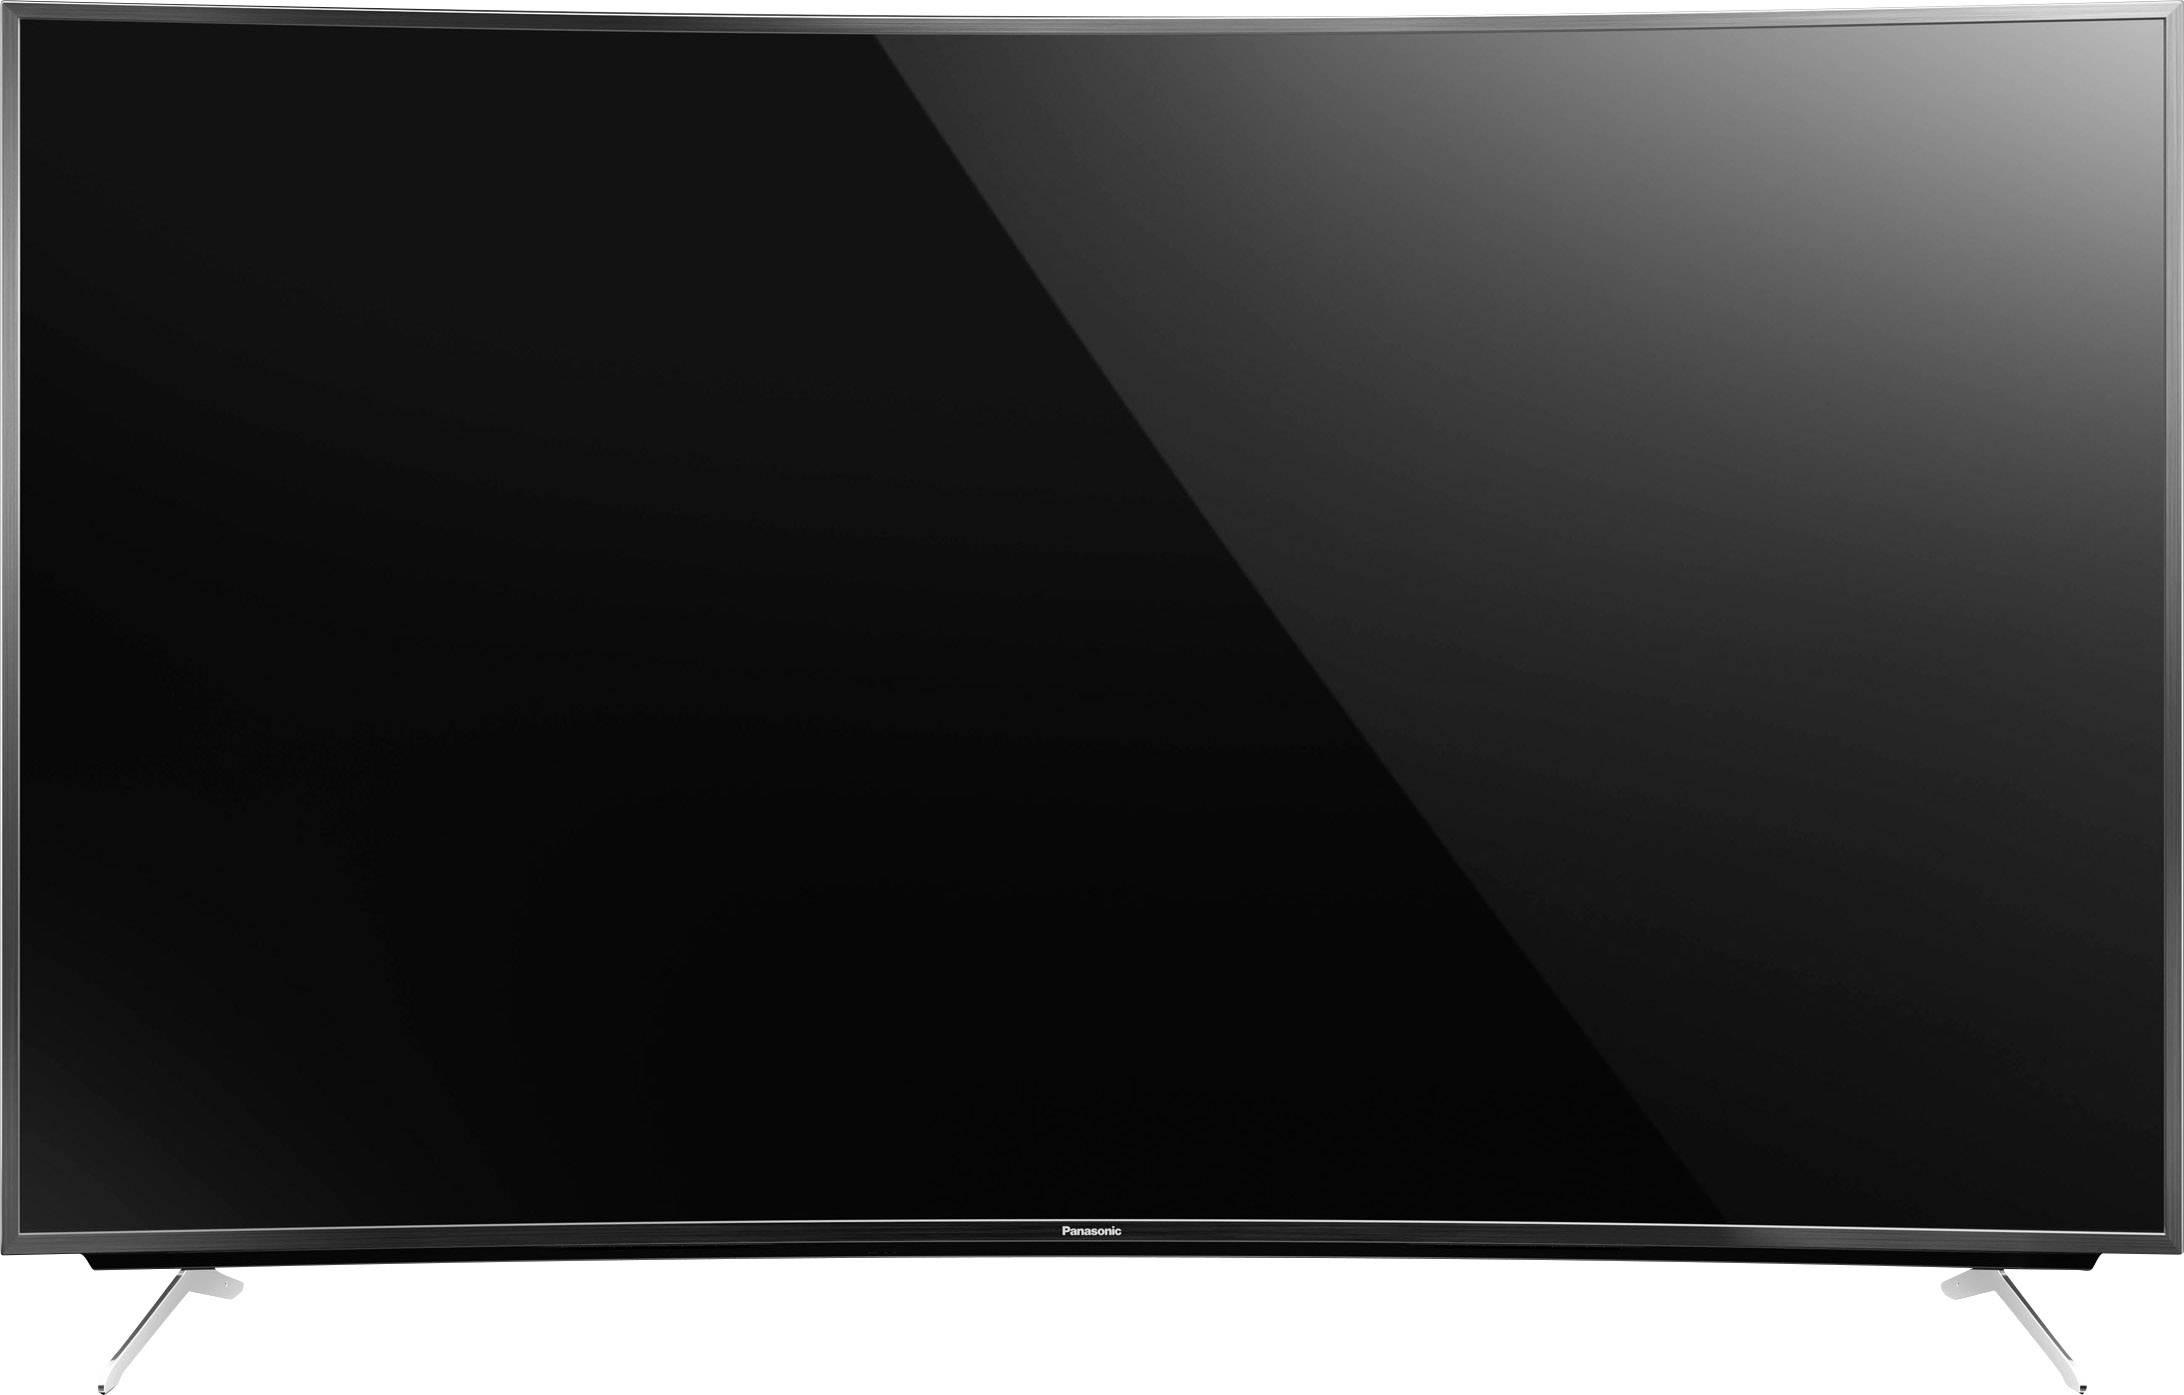 Panasonic Viera TX-65CRW734 TV 64 BIT